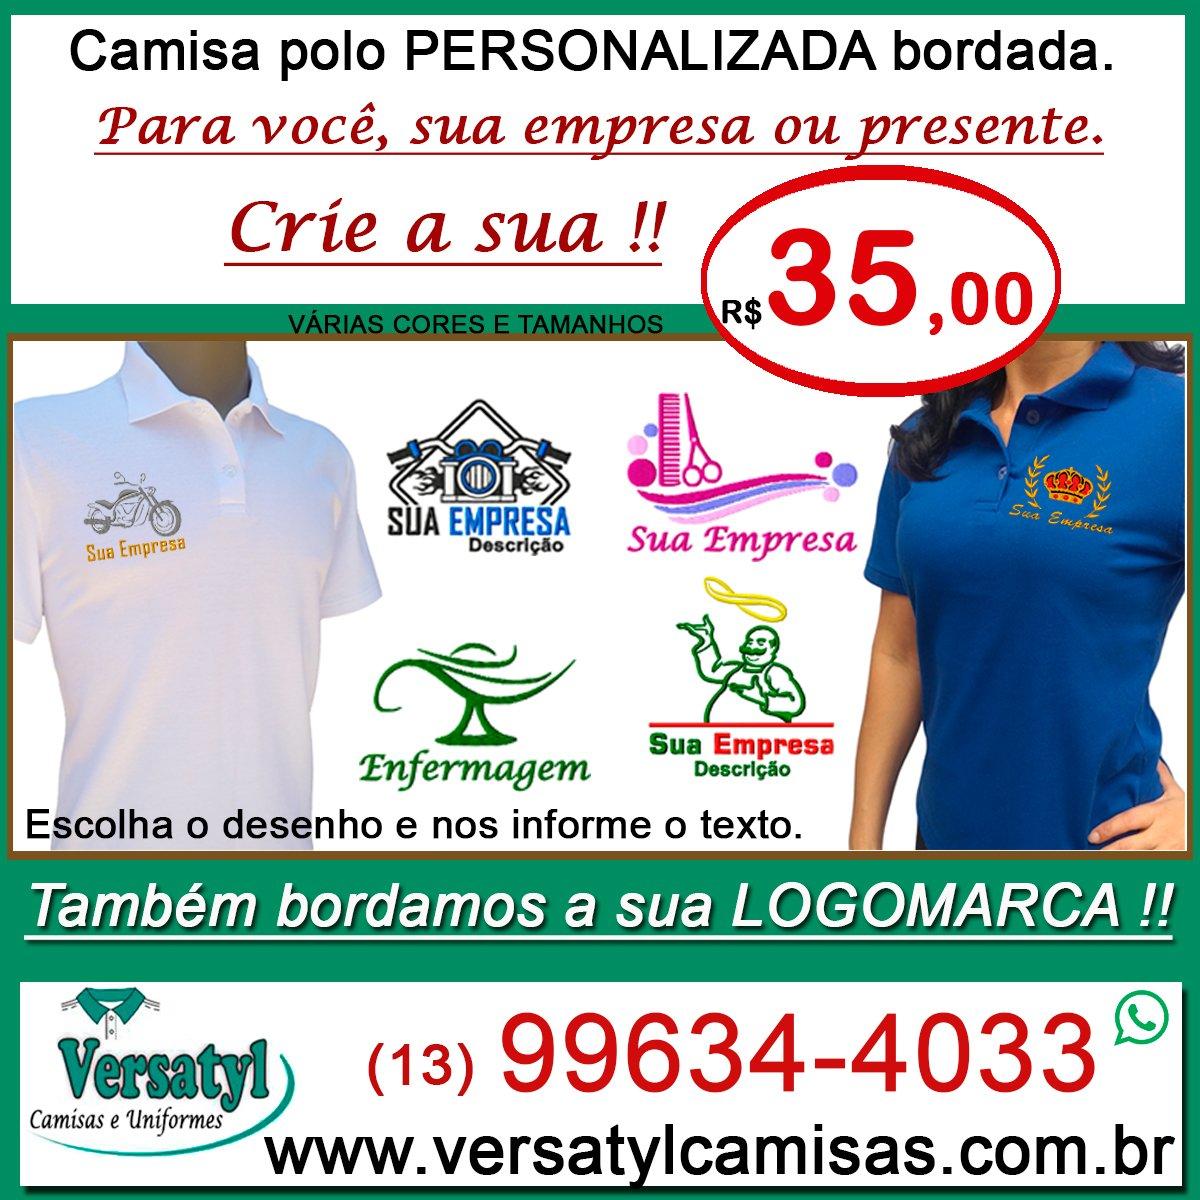 b69030449c Camisa Polo Uniformes. Versatyl Camisas Personalizadas on Twitter